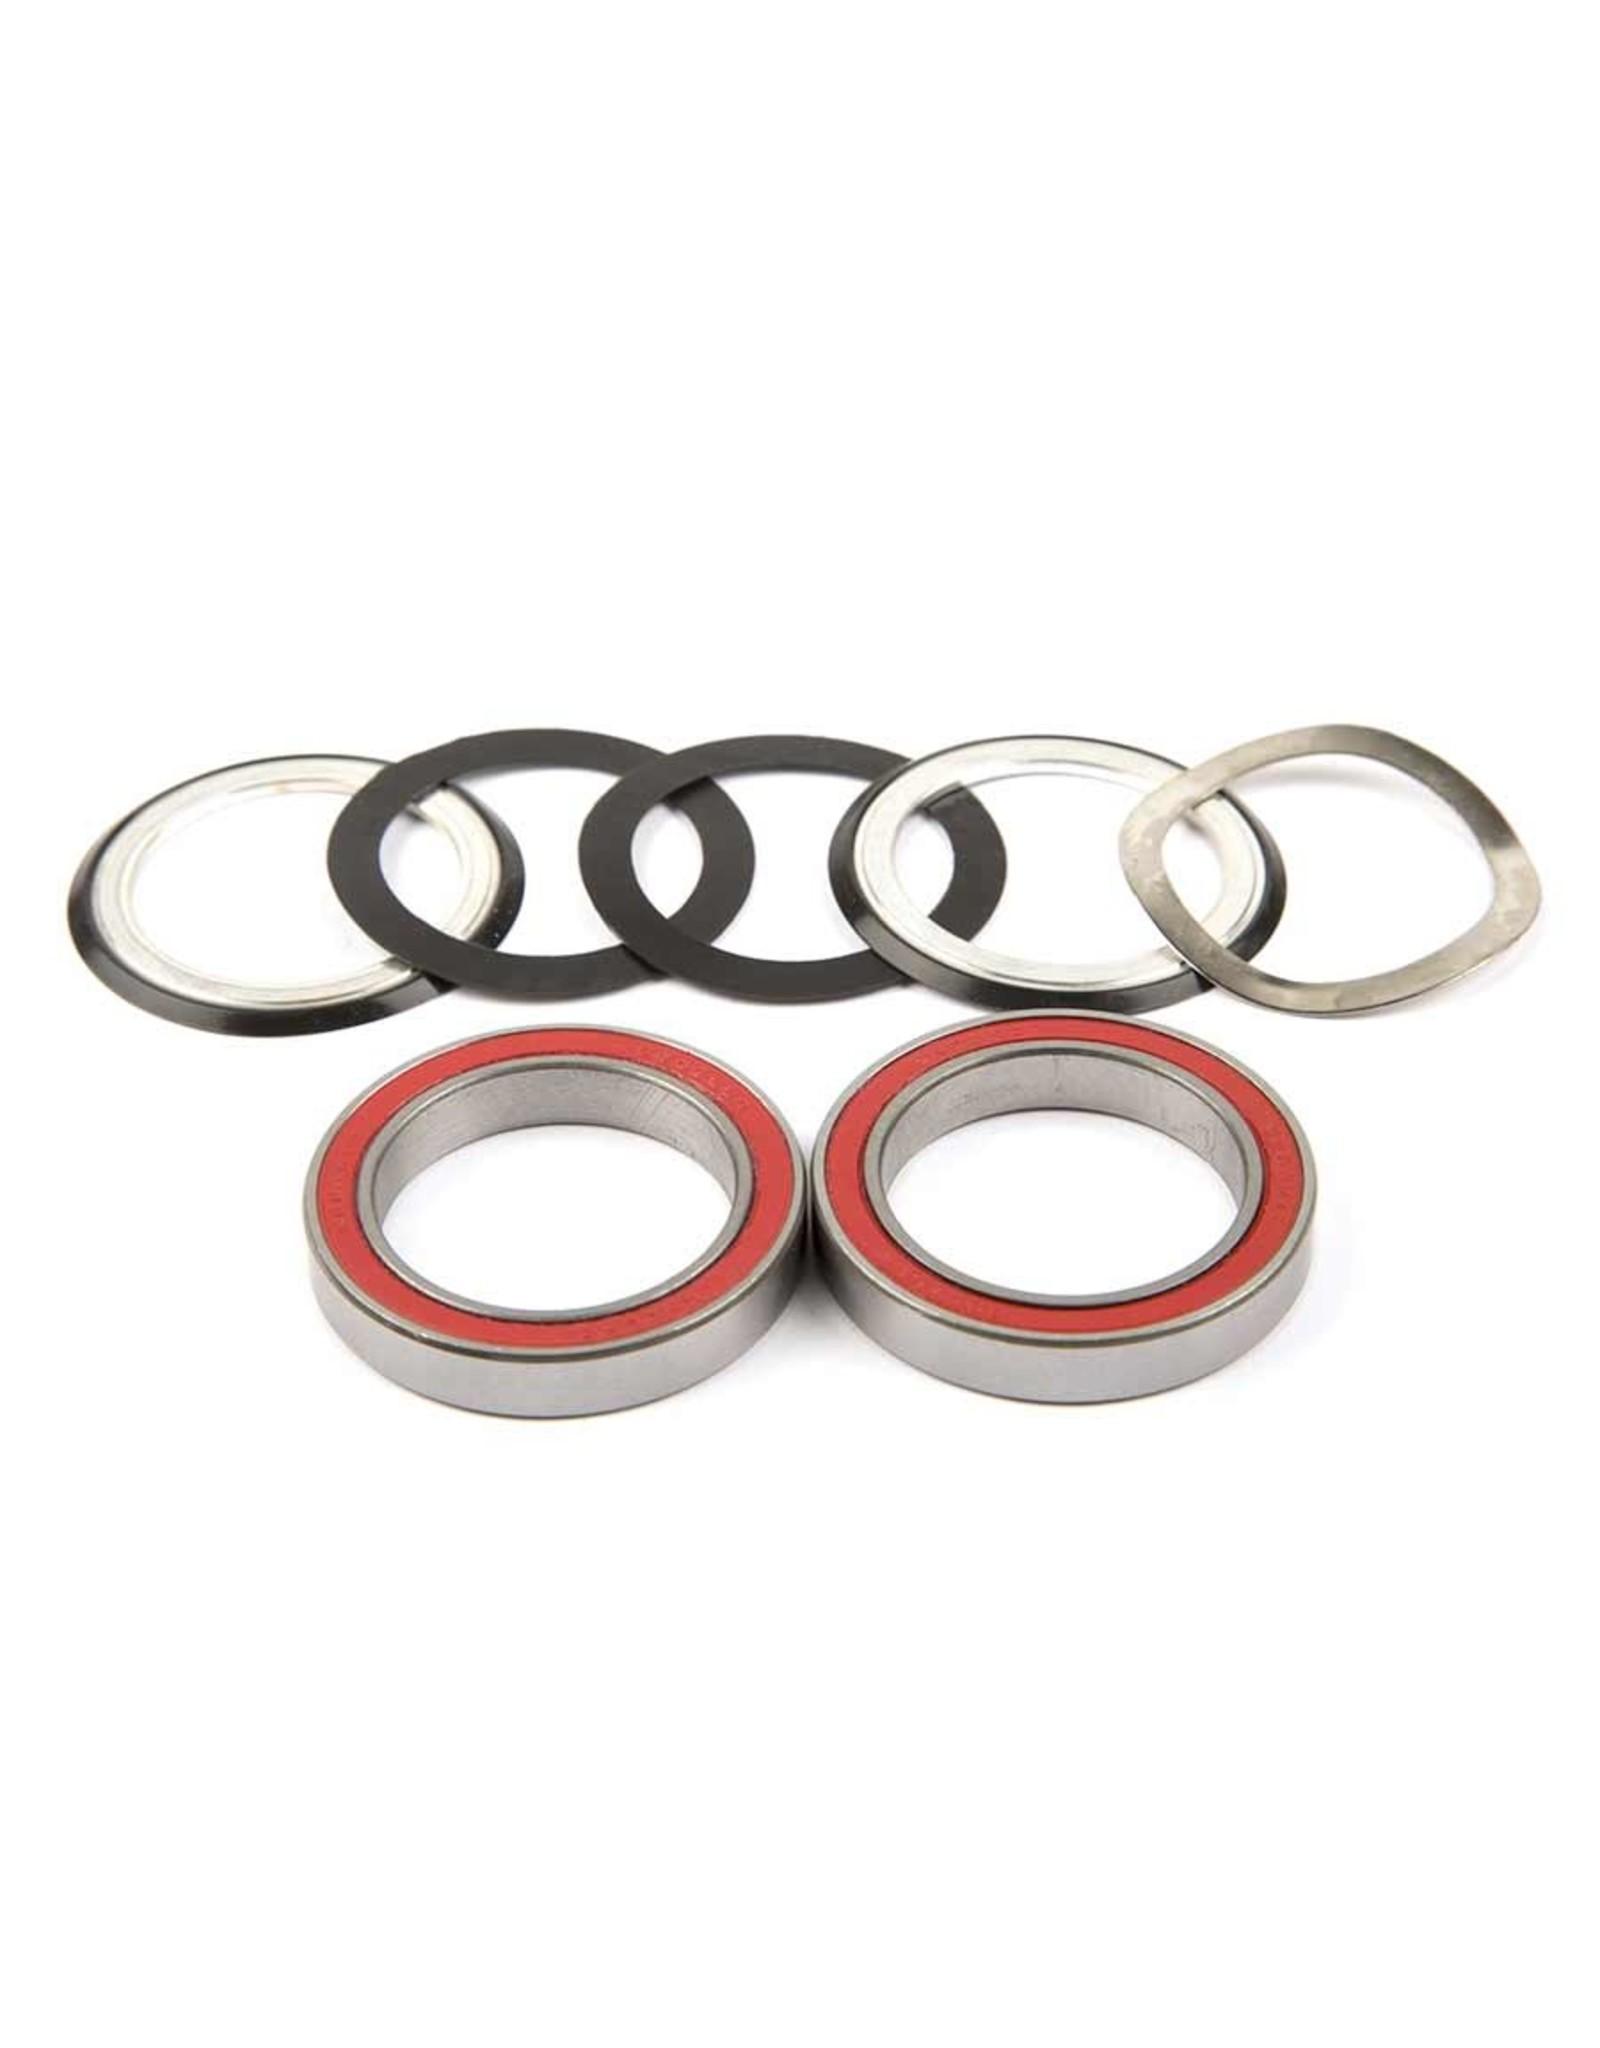 Enduro Enduro, Hybrid ceramic bearing kit, BB30, With seals and washers